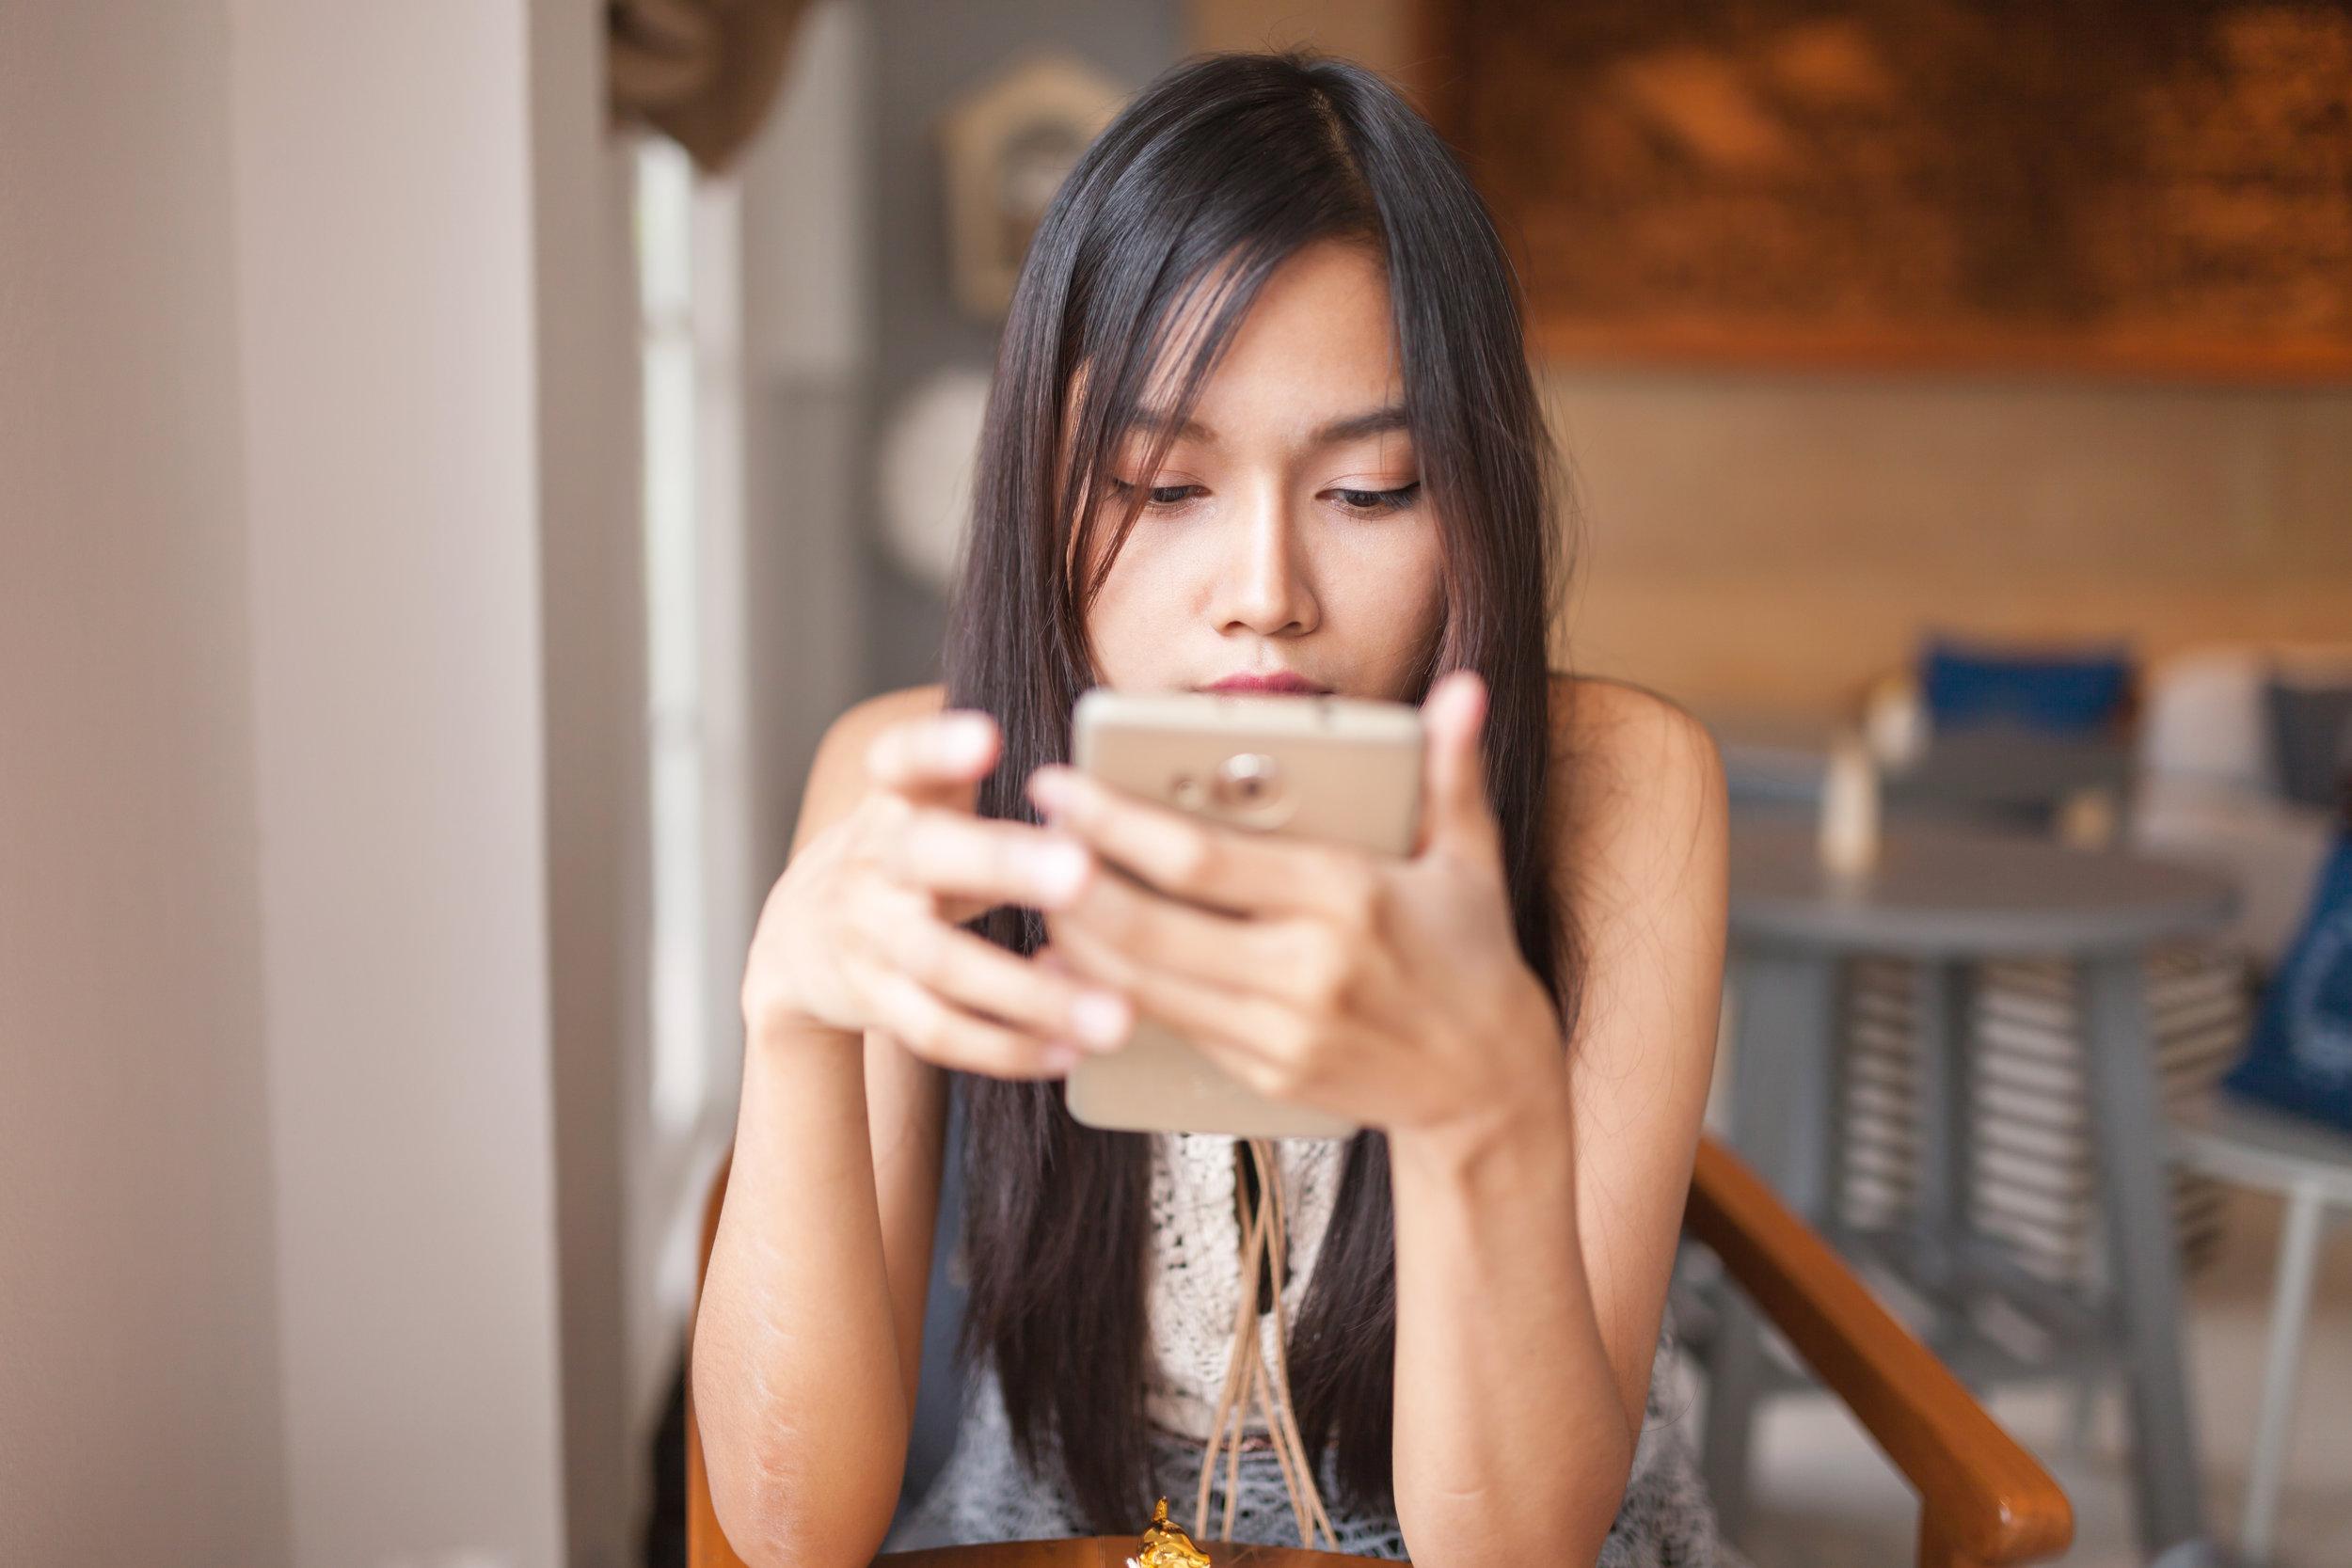 Girl browsing social media on her mobile device